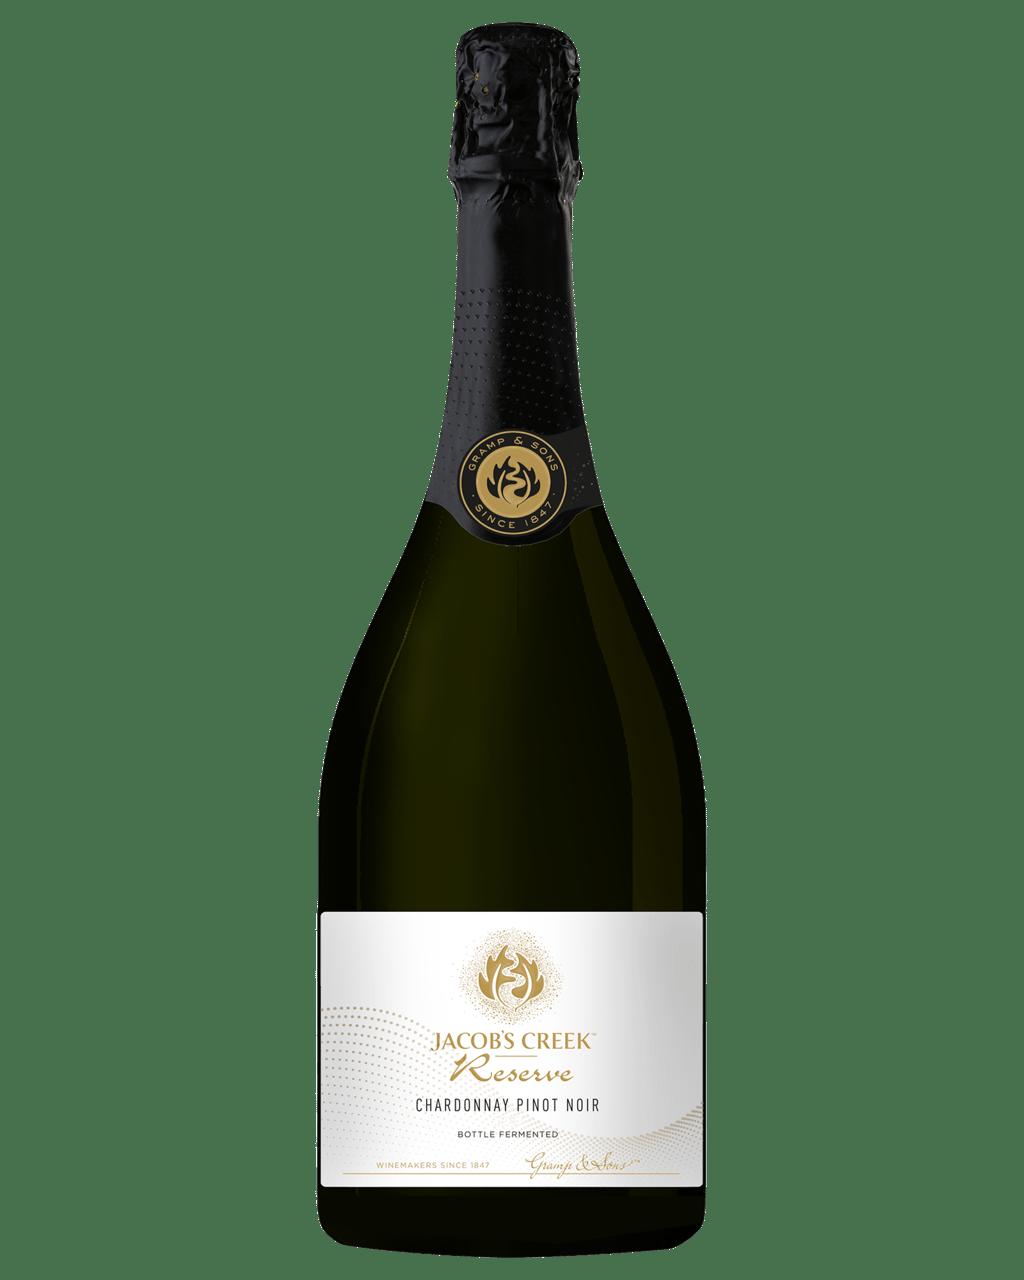 Jacob's Creek Reserve Chardonnay Pinot Noir